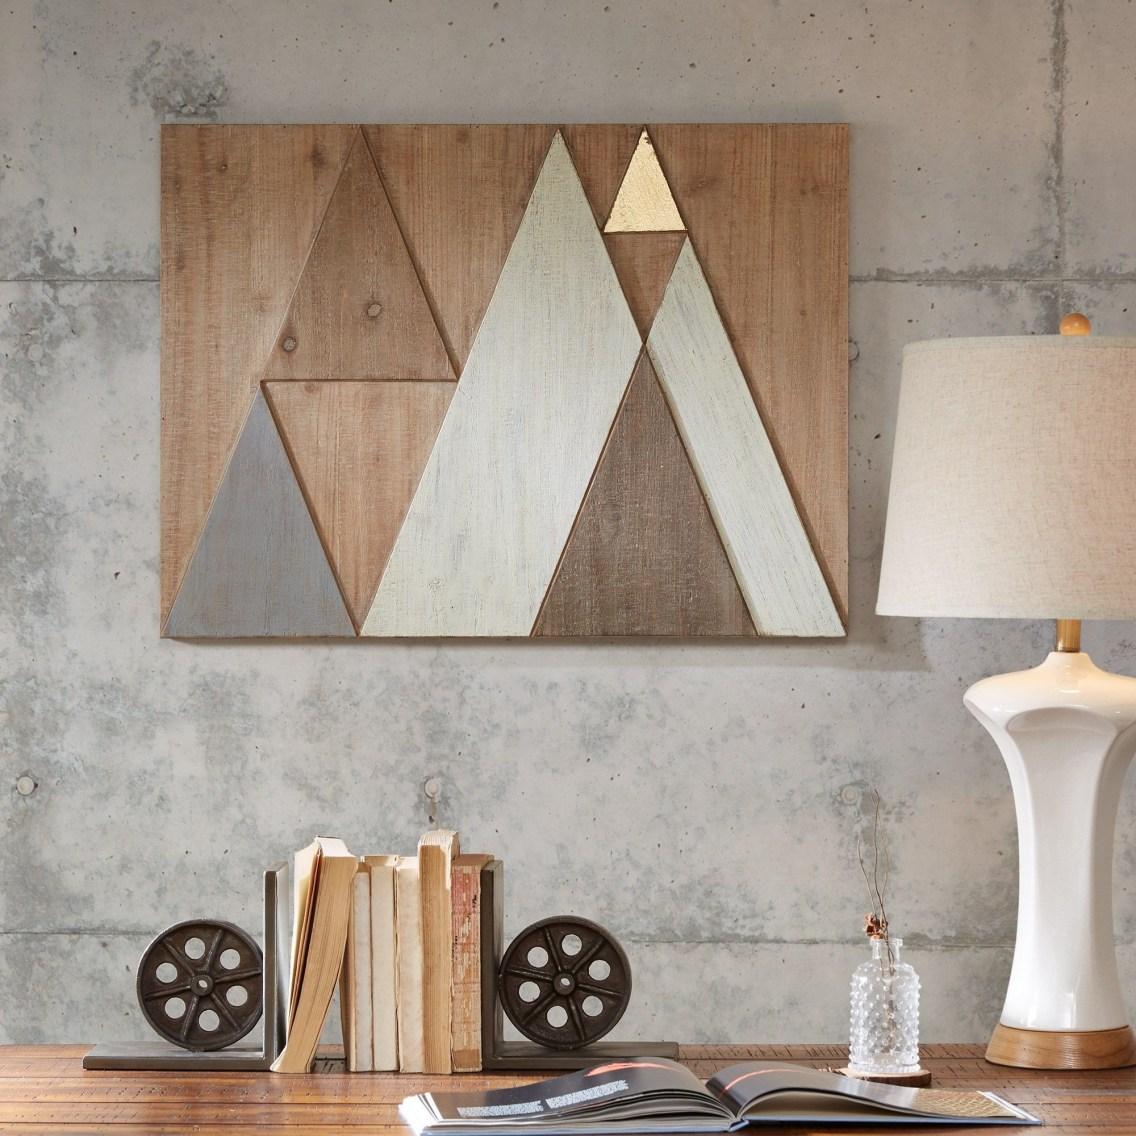 Unique Wood Walls Design Ideas For Your Home42